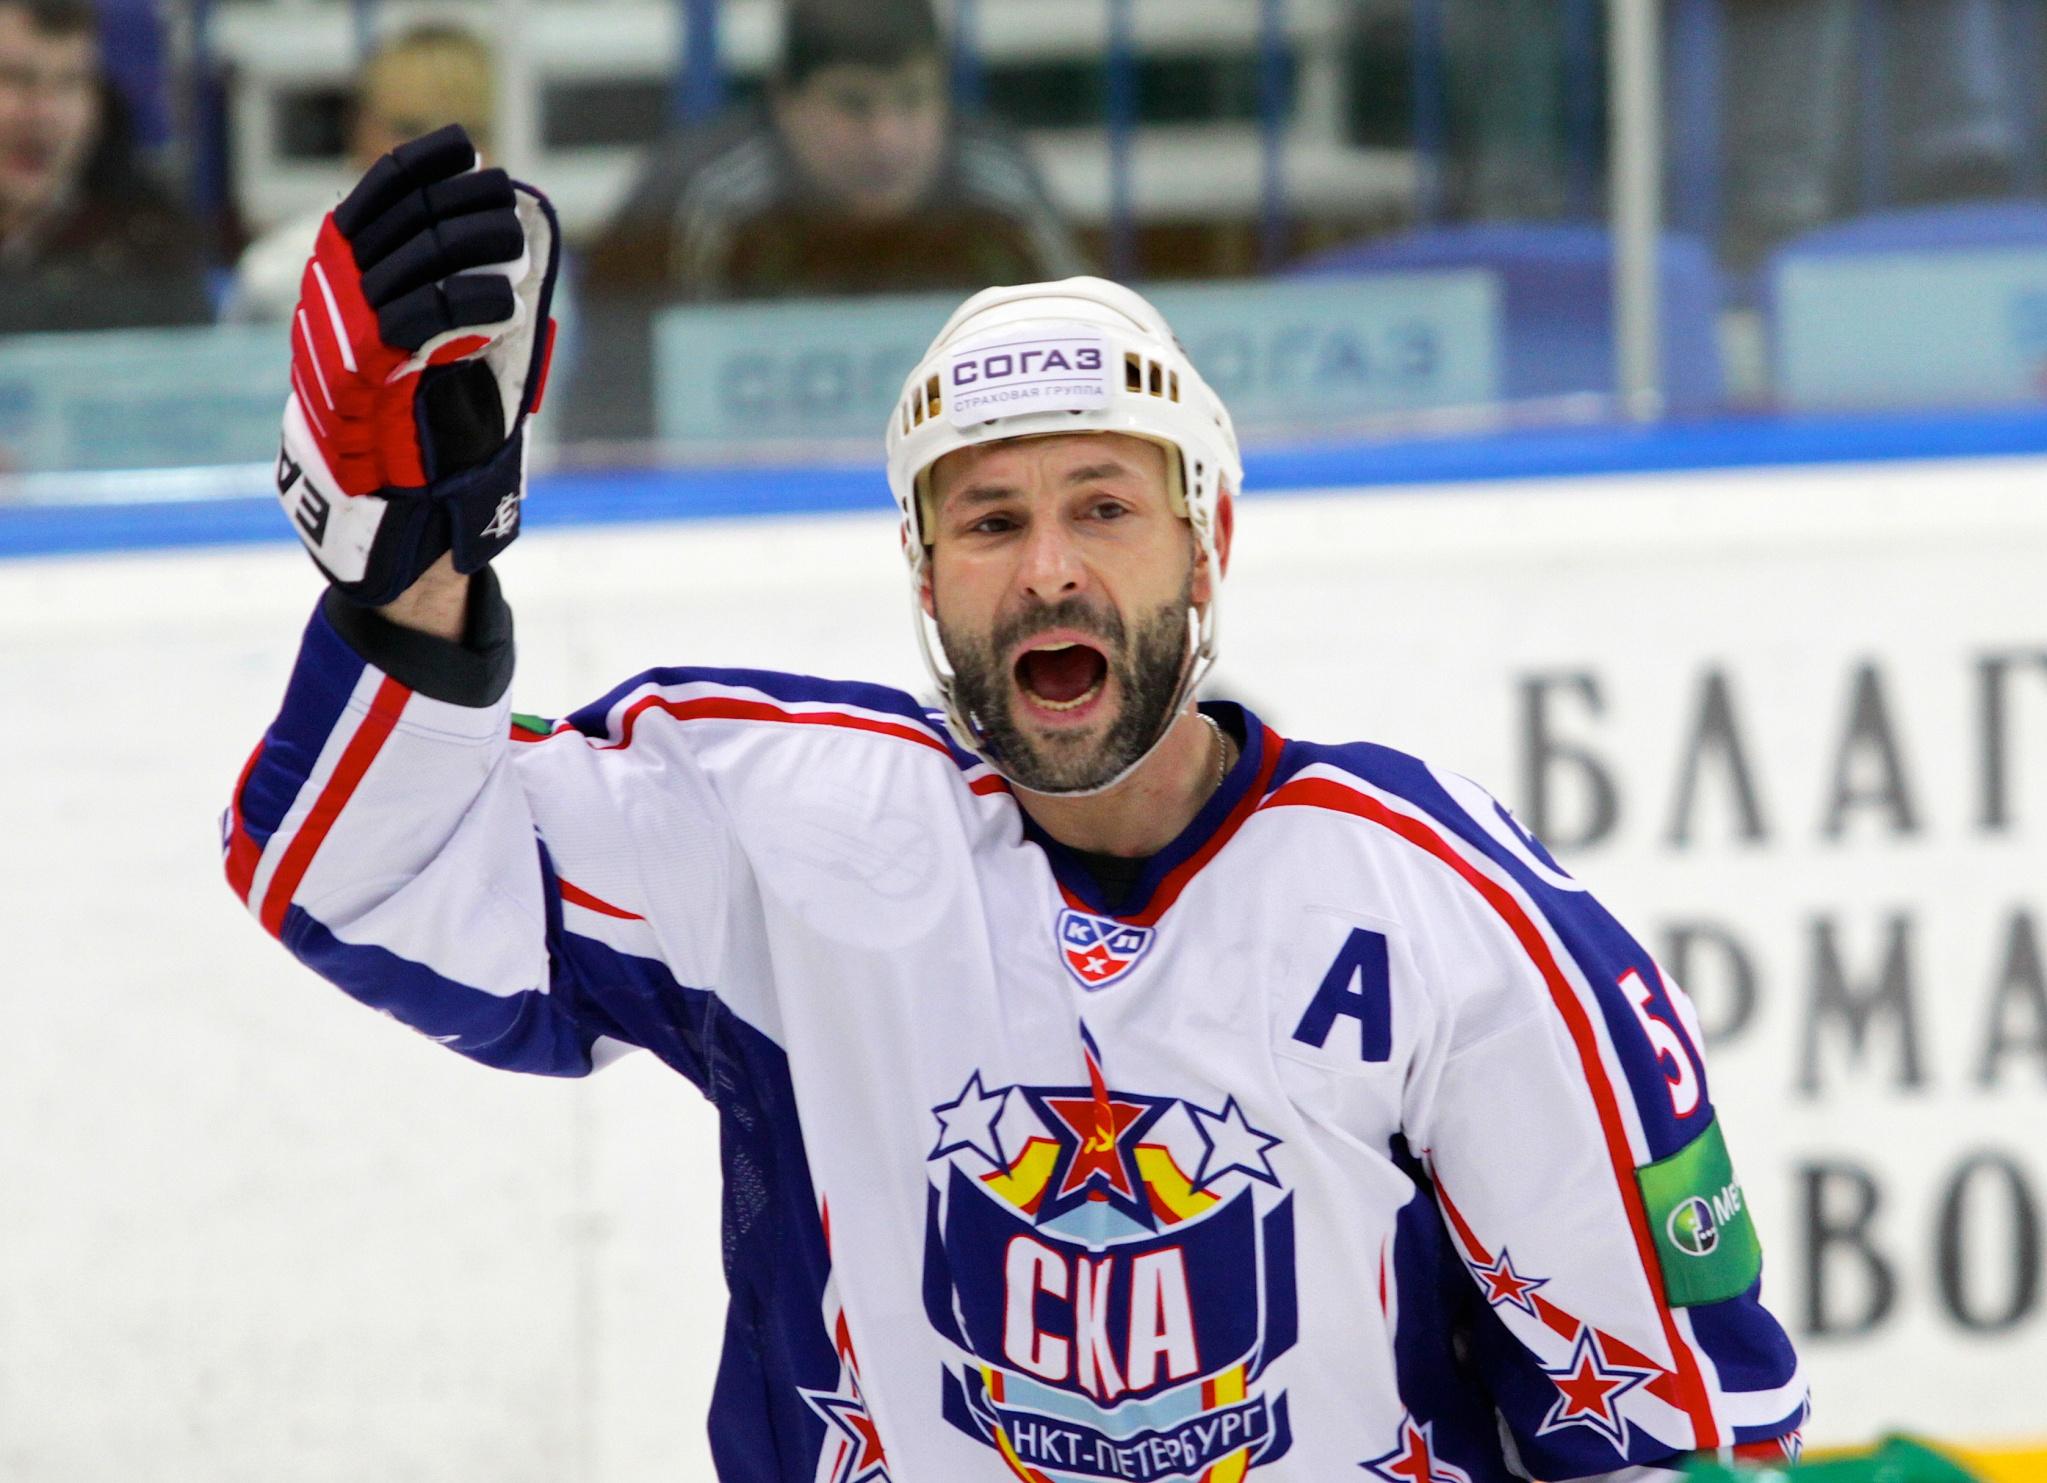 Сергей Зубов. Фото: Юлия Дмитриева